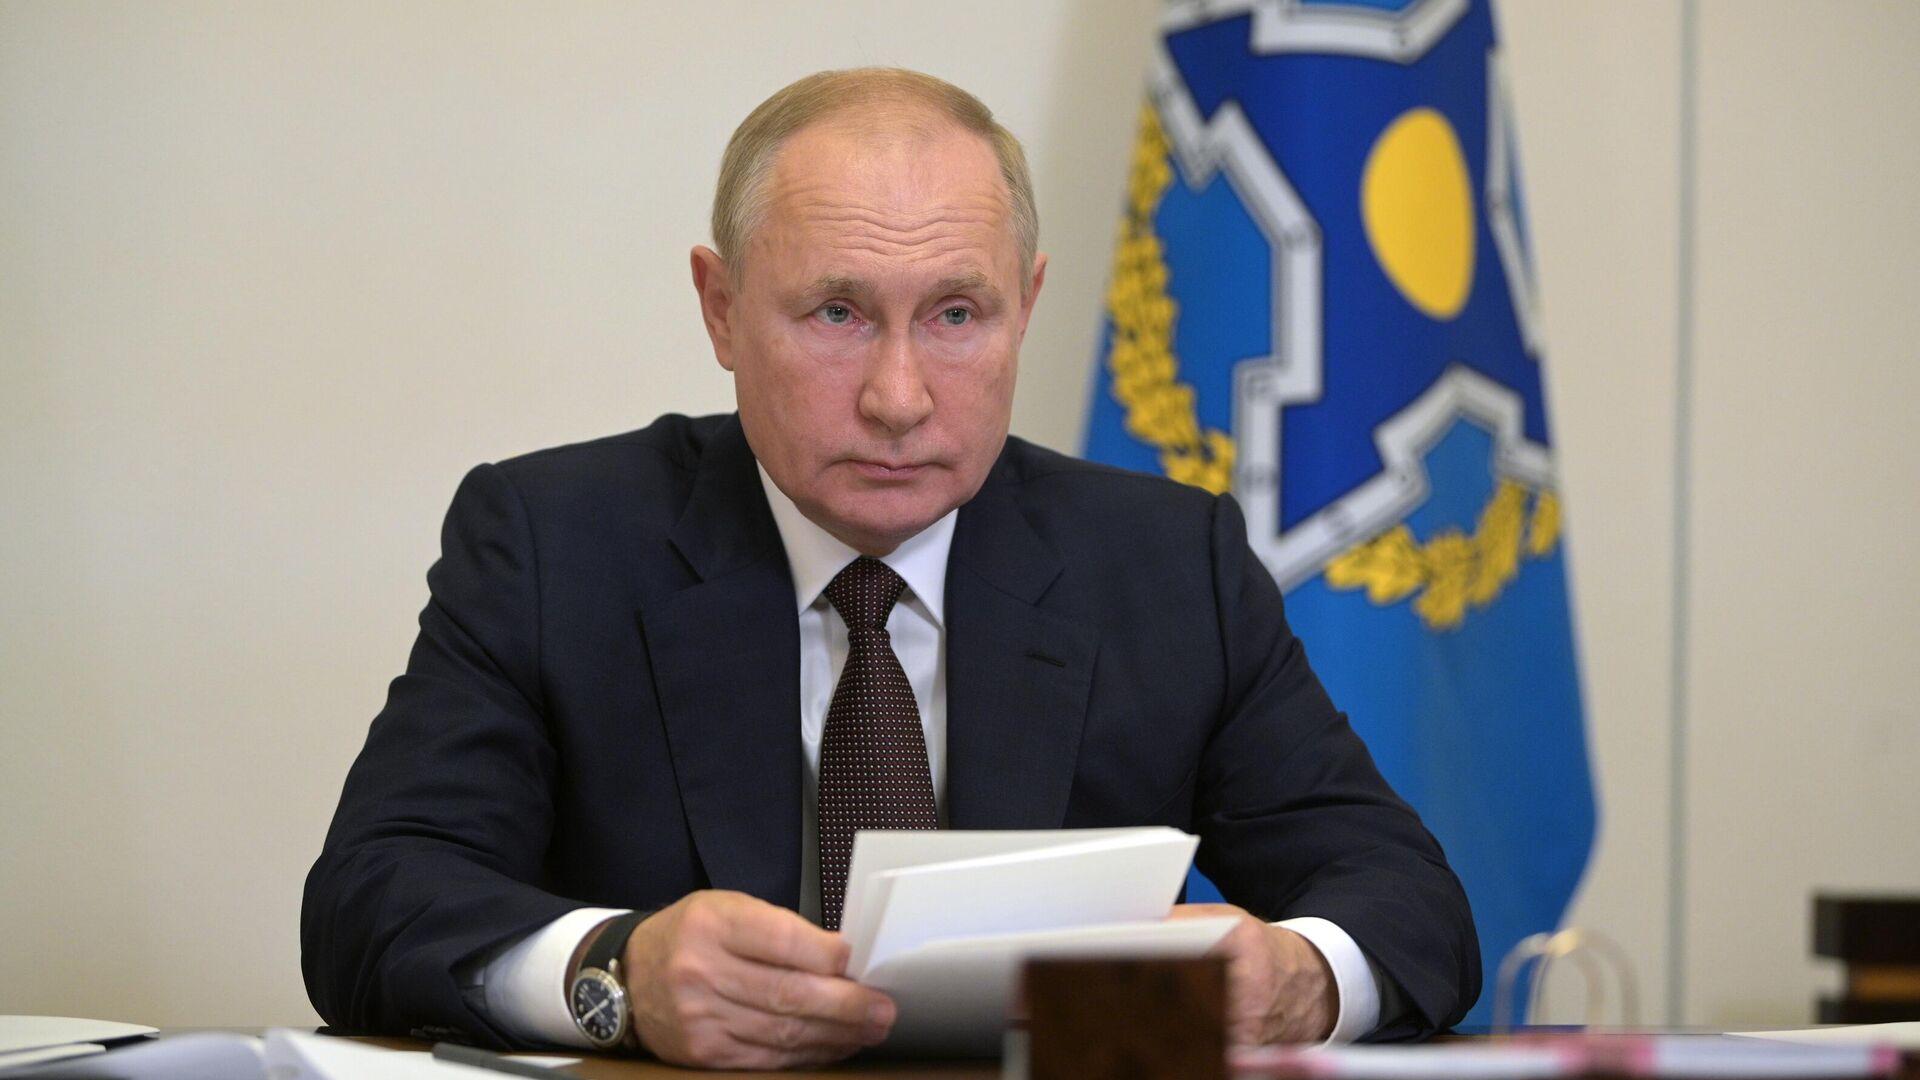 Президент РФ Владимир Путин - Sputnik Ўзбекистон, 1920, 16.09.2021